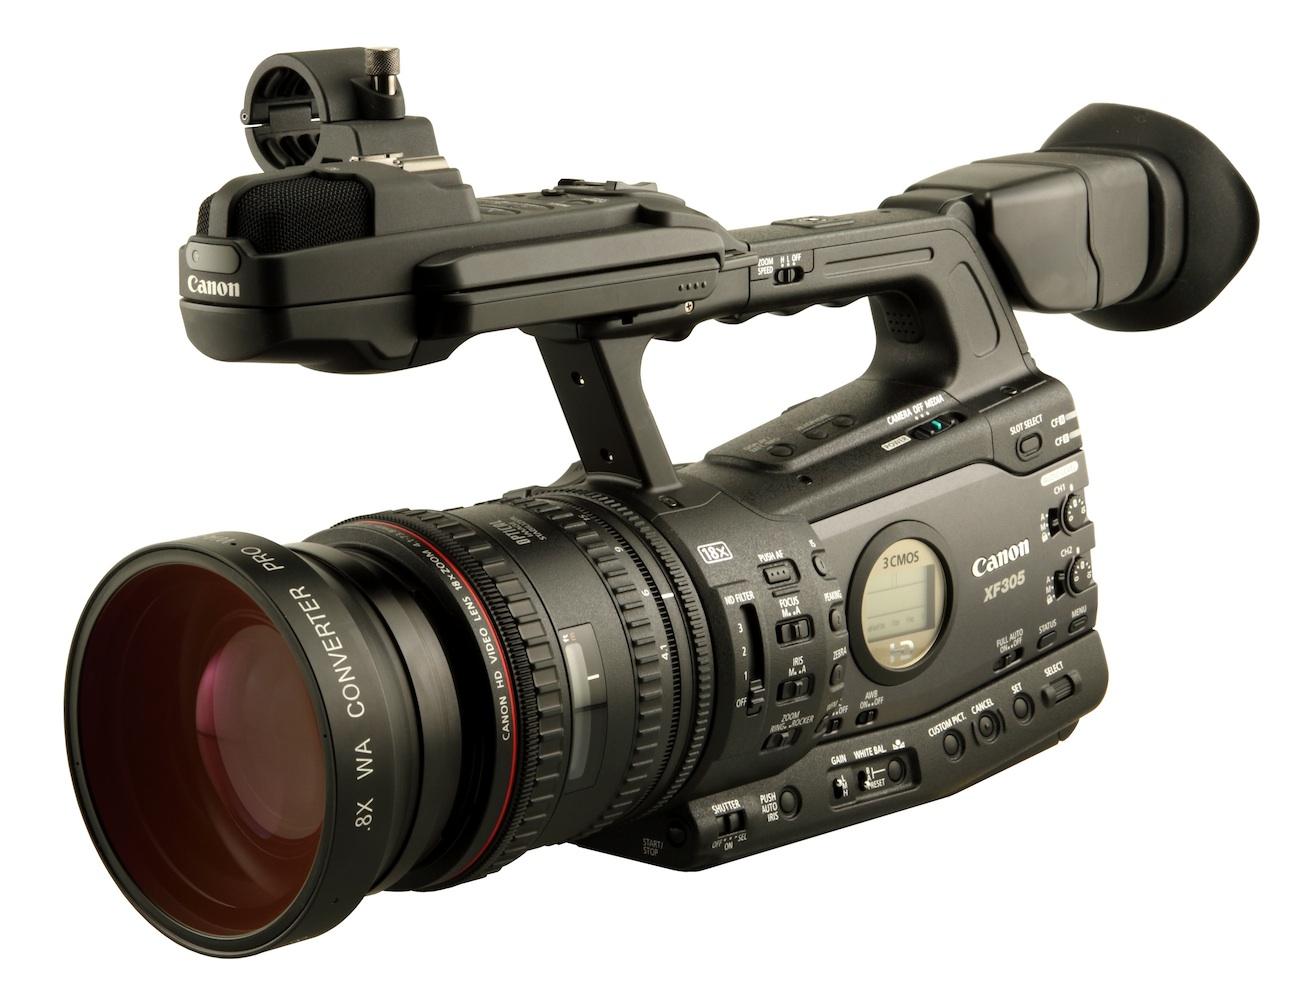 http://4.bp.blogspot.com/_xYMkl-Jw6Fc/TT8F_oYERsI/AAAAAAAABNk/Khd7OaKT8TE/s1600/Century%2Badapter%2Bon%2BXF305.jpg